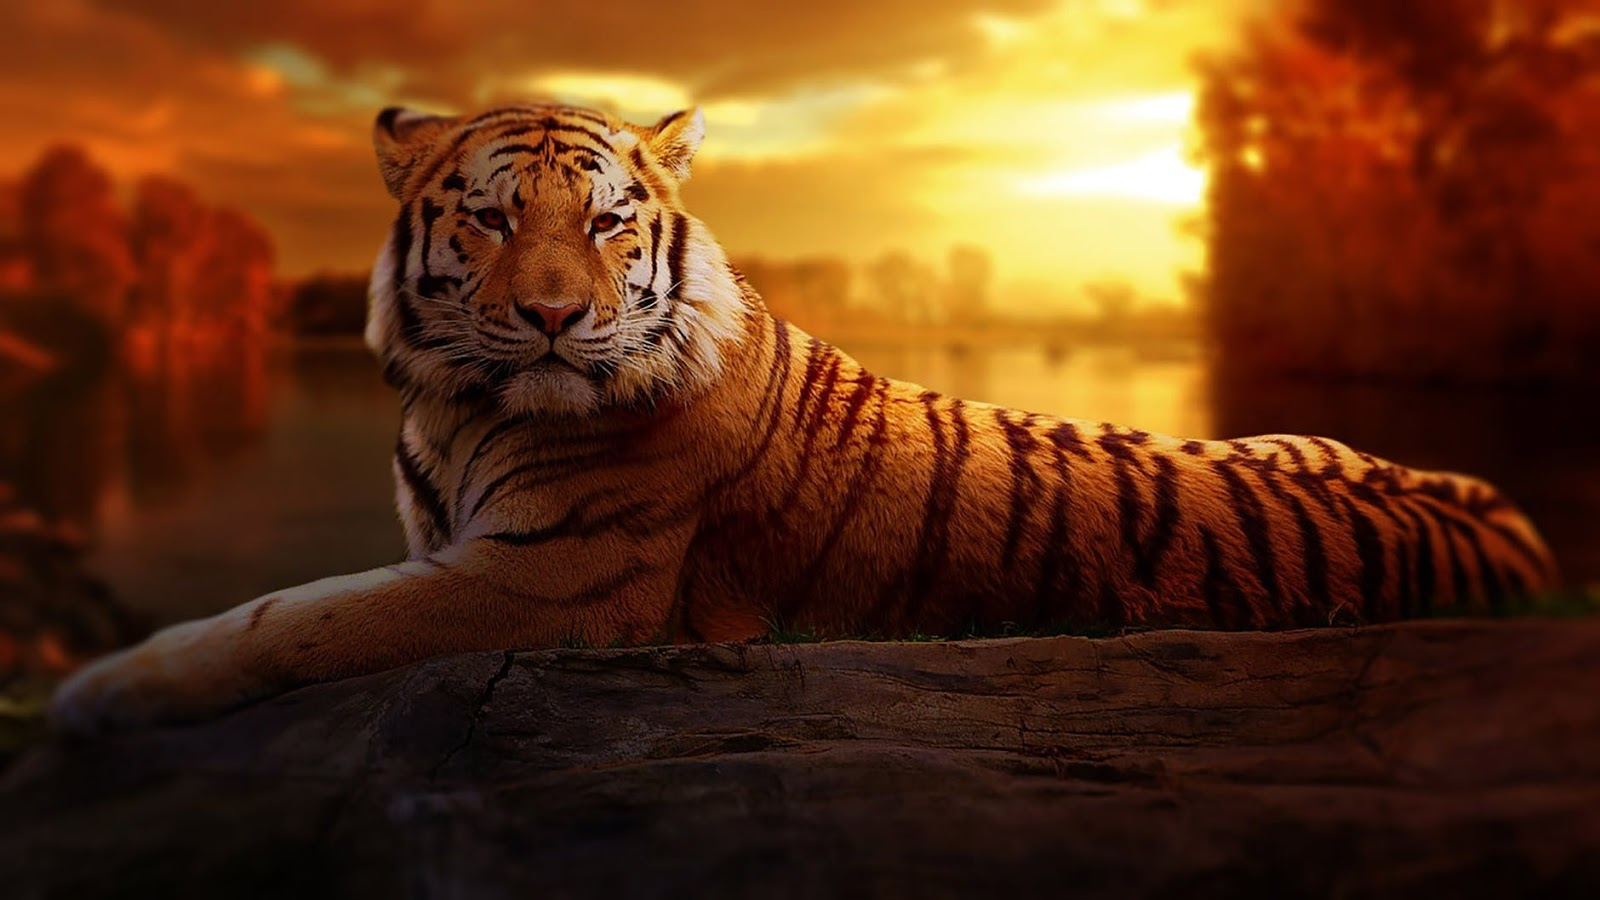 4k ultra hd animal wallpaper images biography and india 39 s - Ultra hd animal wallpapers ...